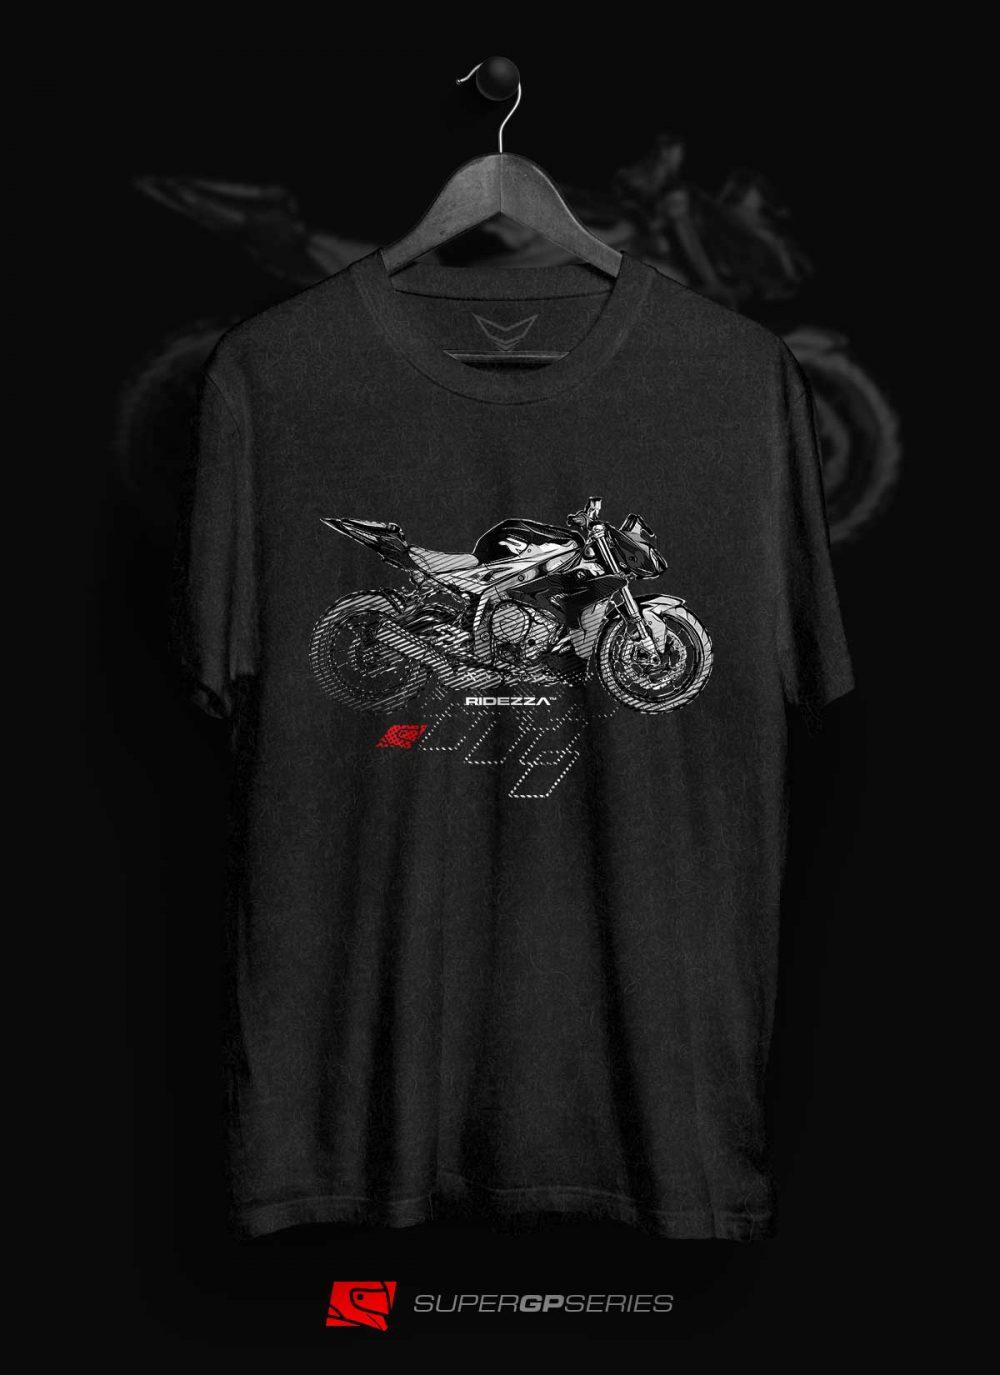 Ridezza S1000R SuperGP Series T-Shirt